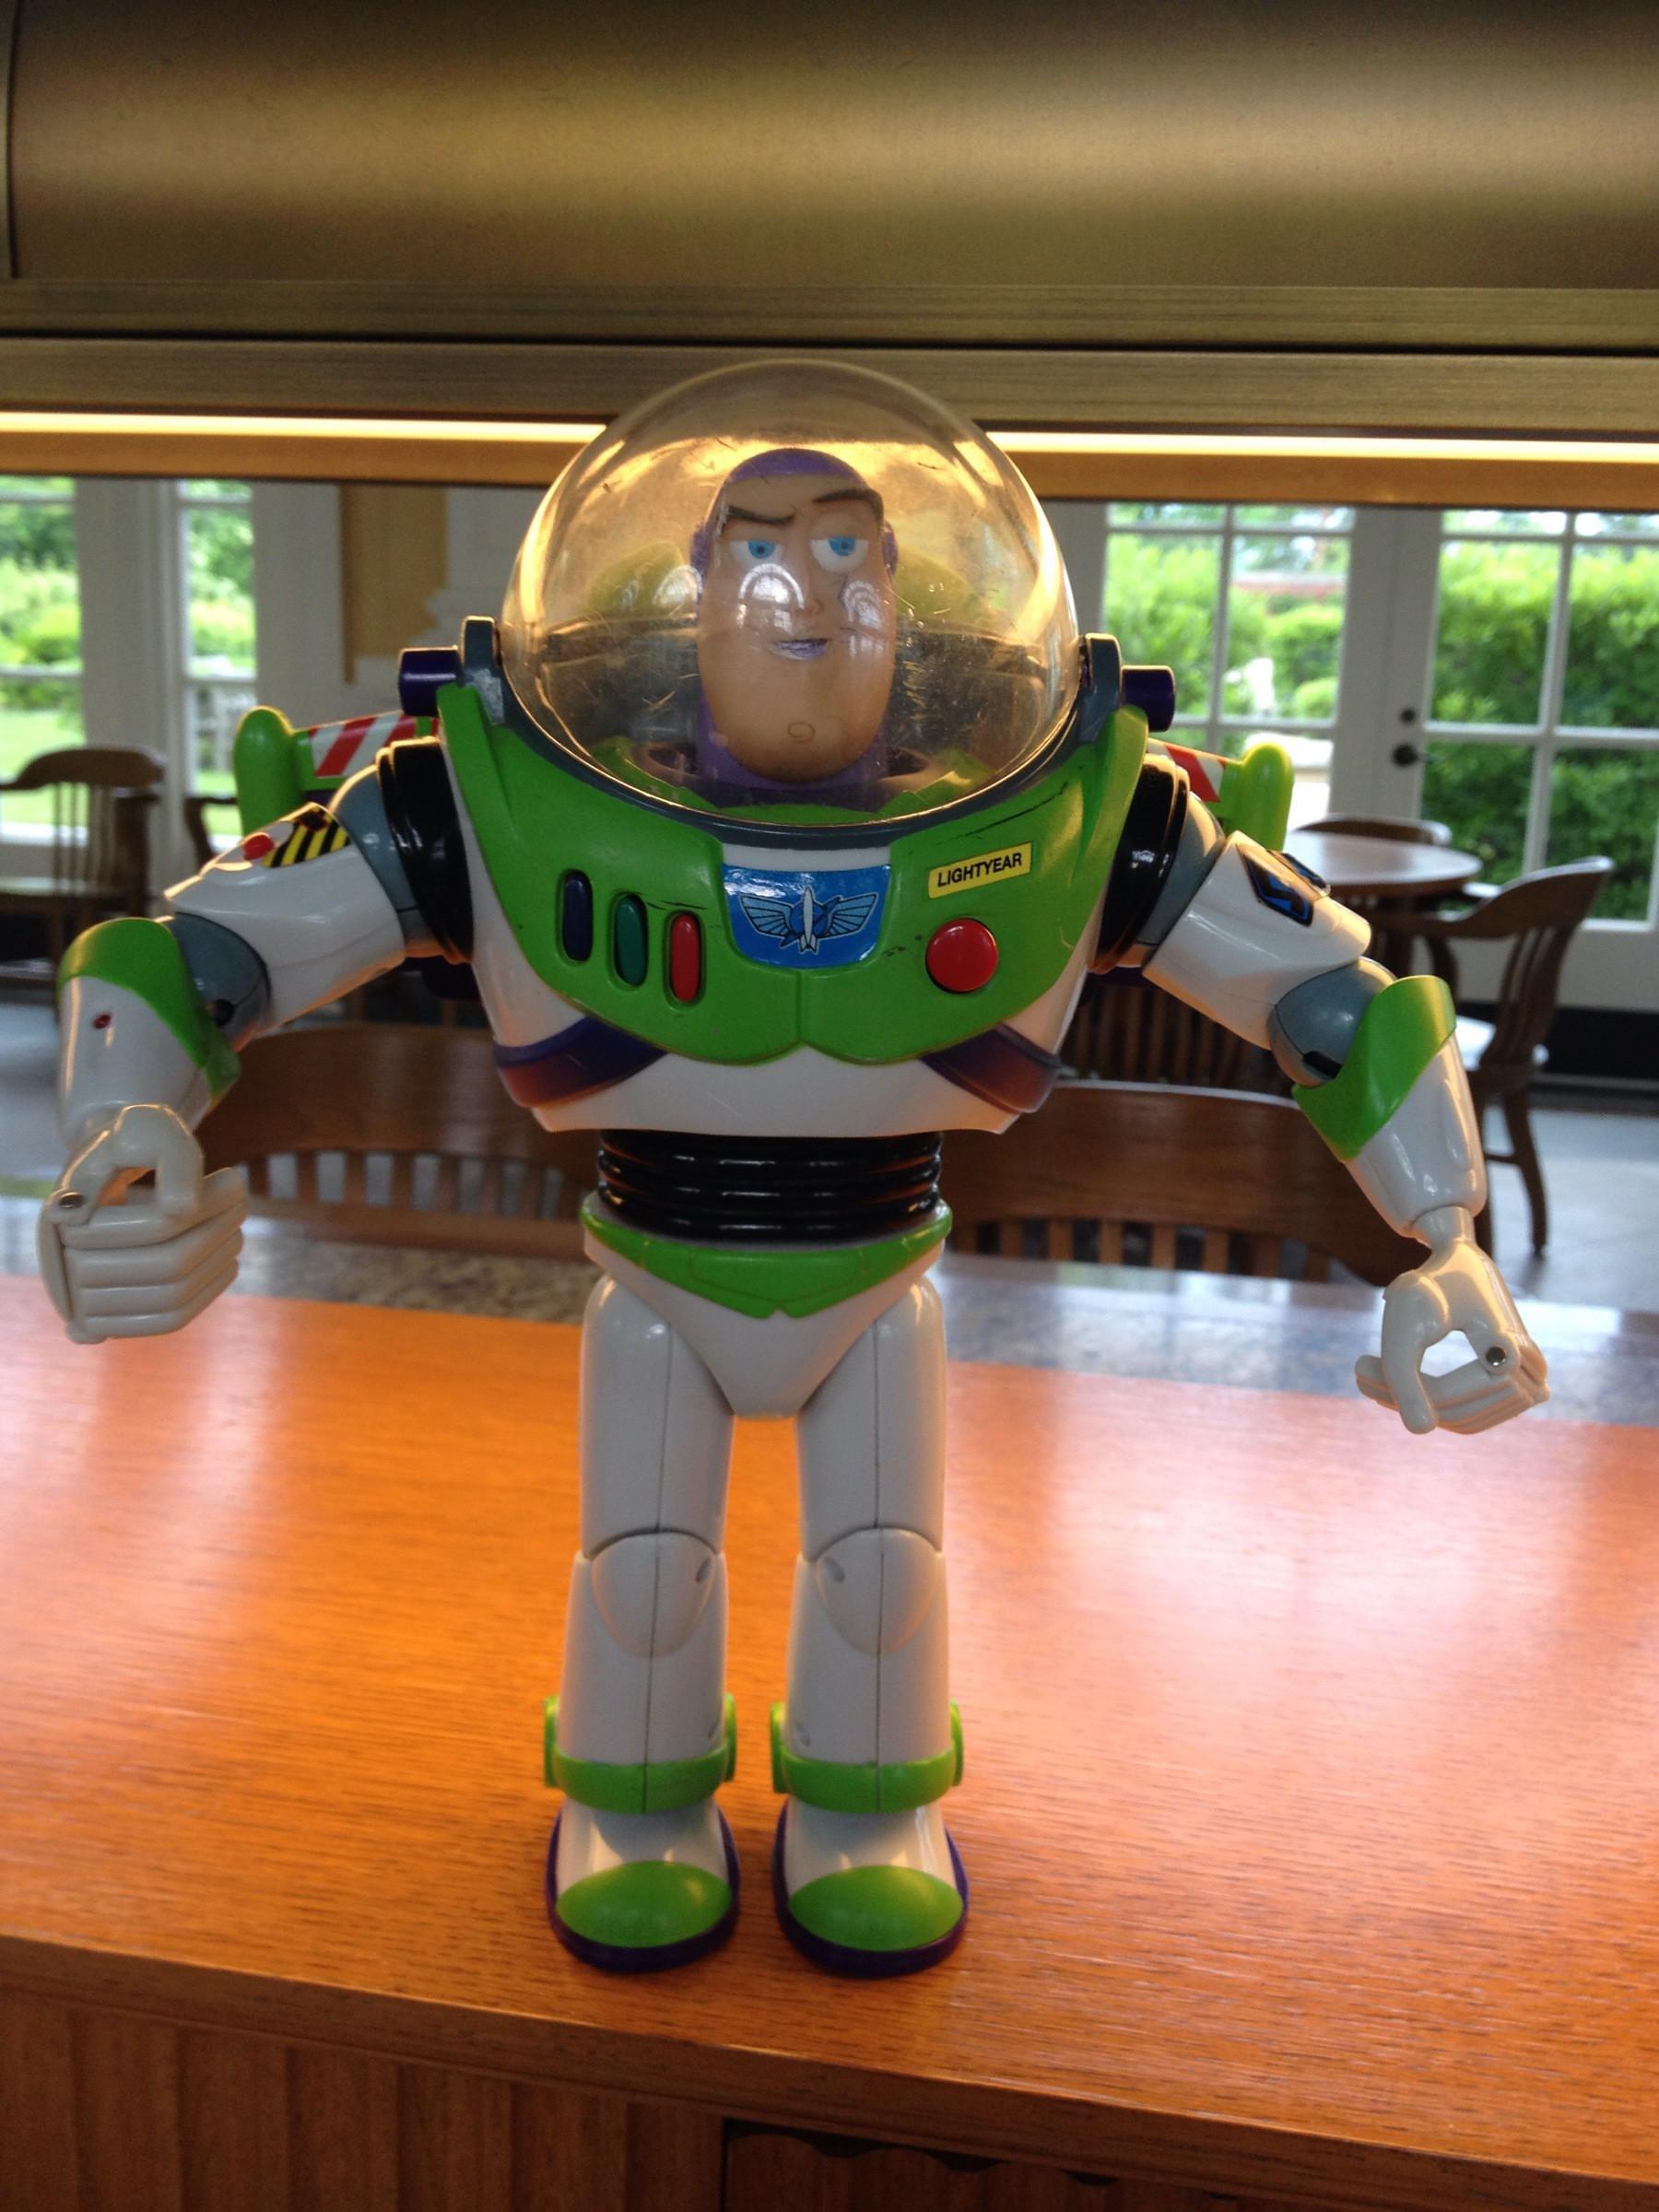 Full sized Buzz Lightyear